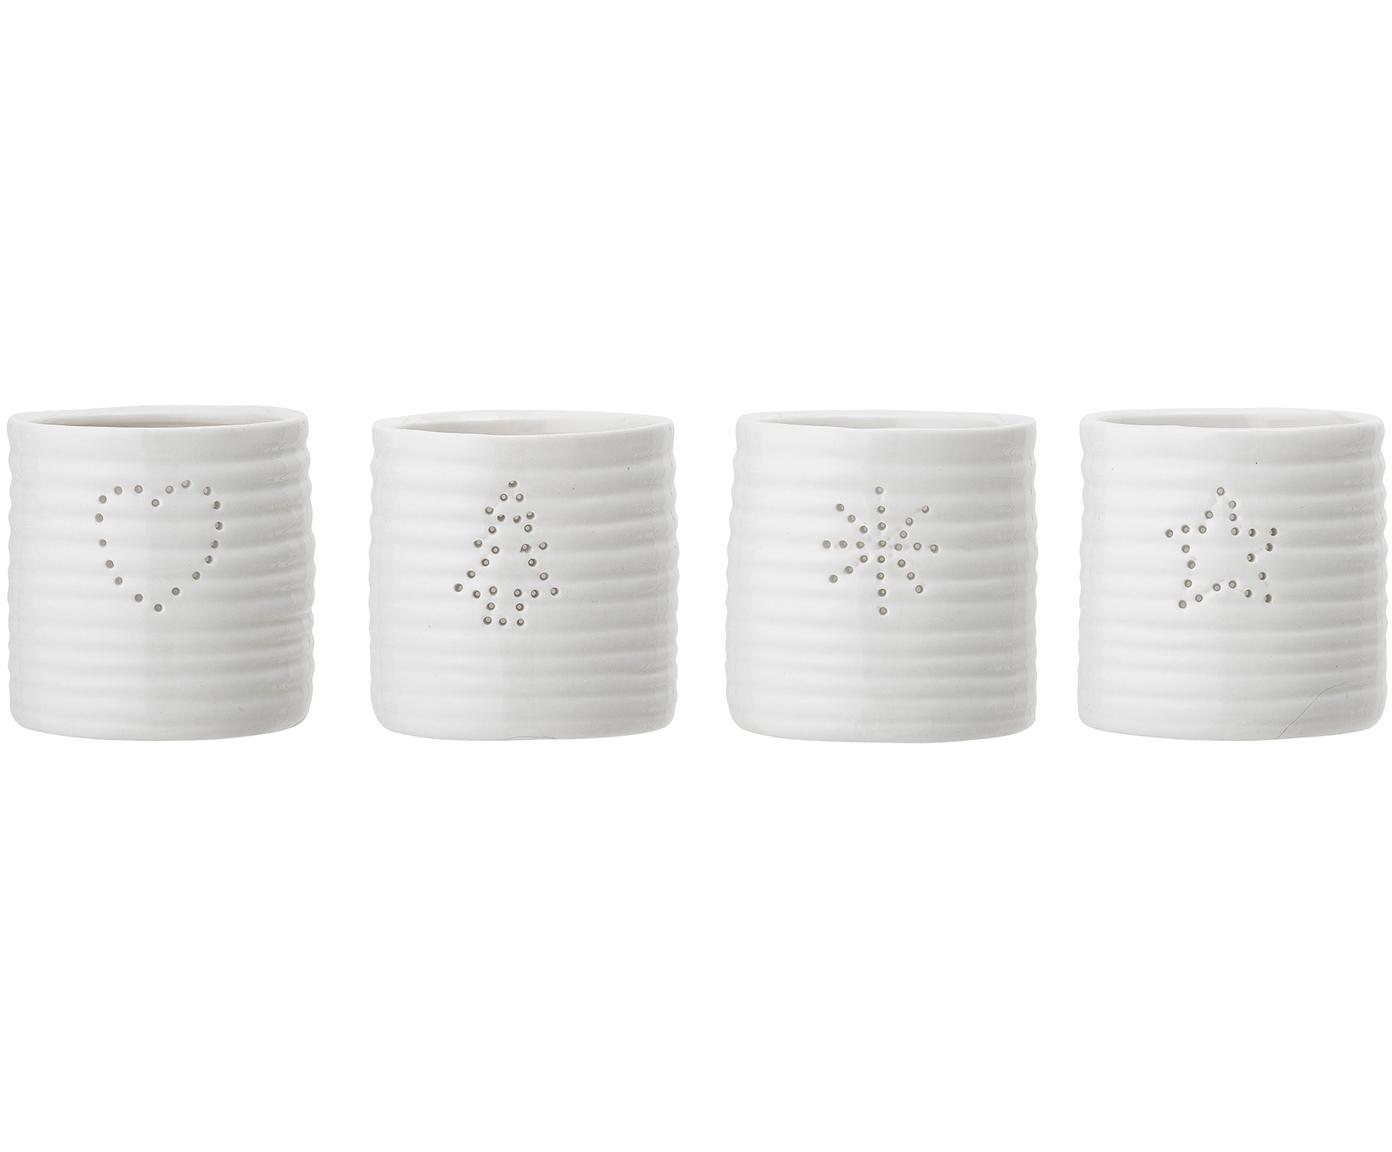 Waxinelichthoudersset Sara, 4-delig, Keramiek, Wit, Ø 7 cm